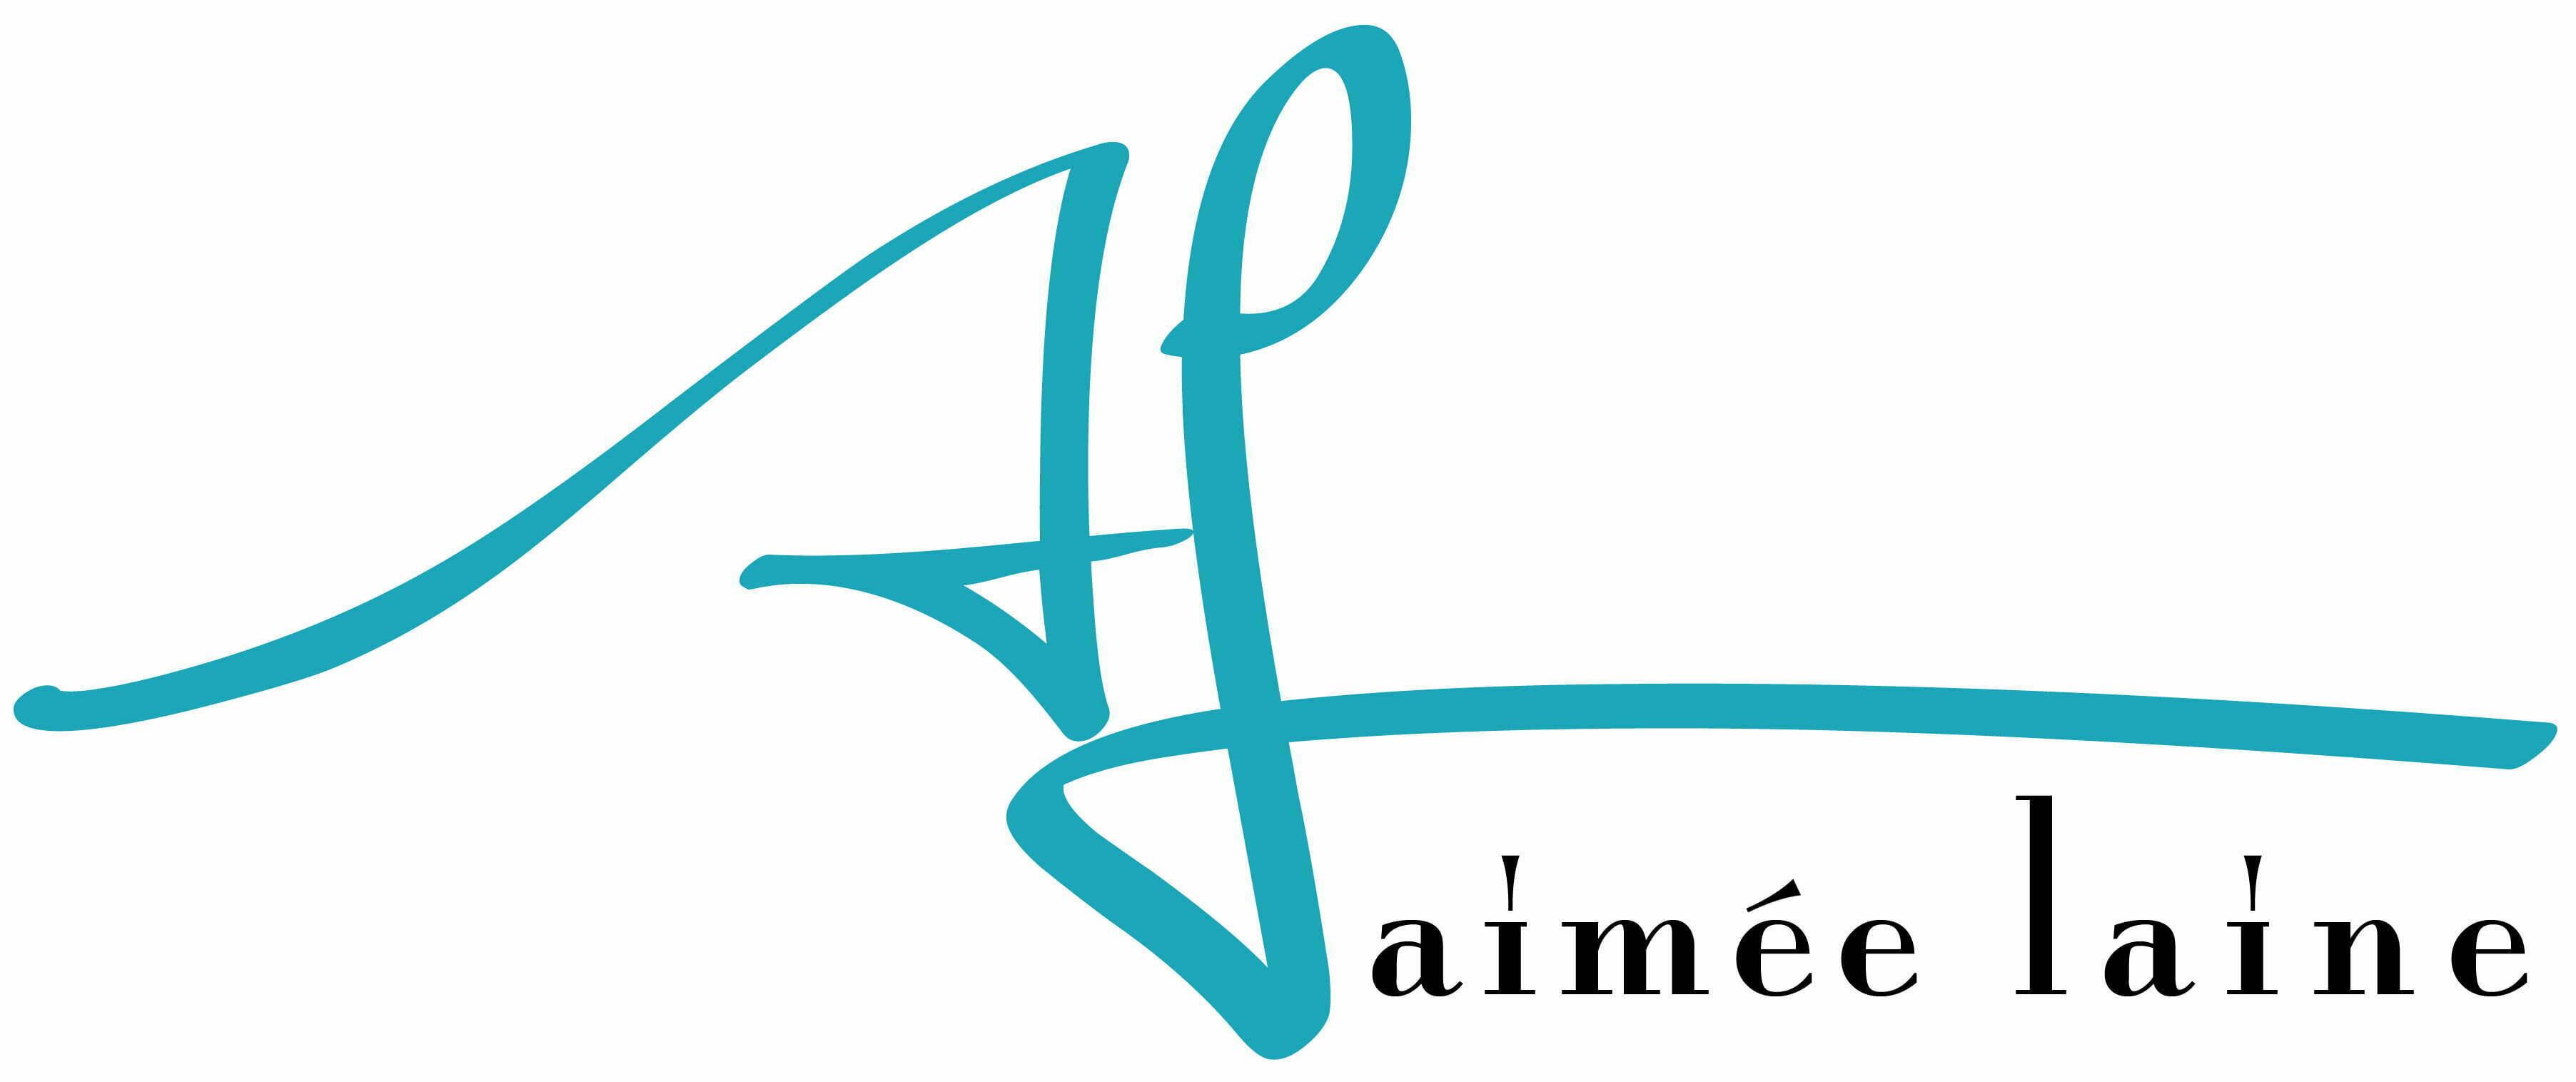 aimee_laine_logo_final